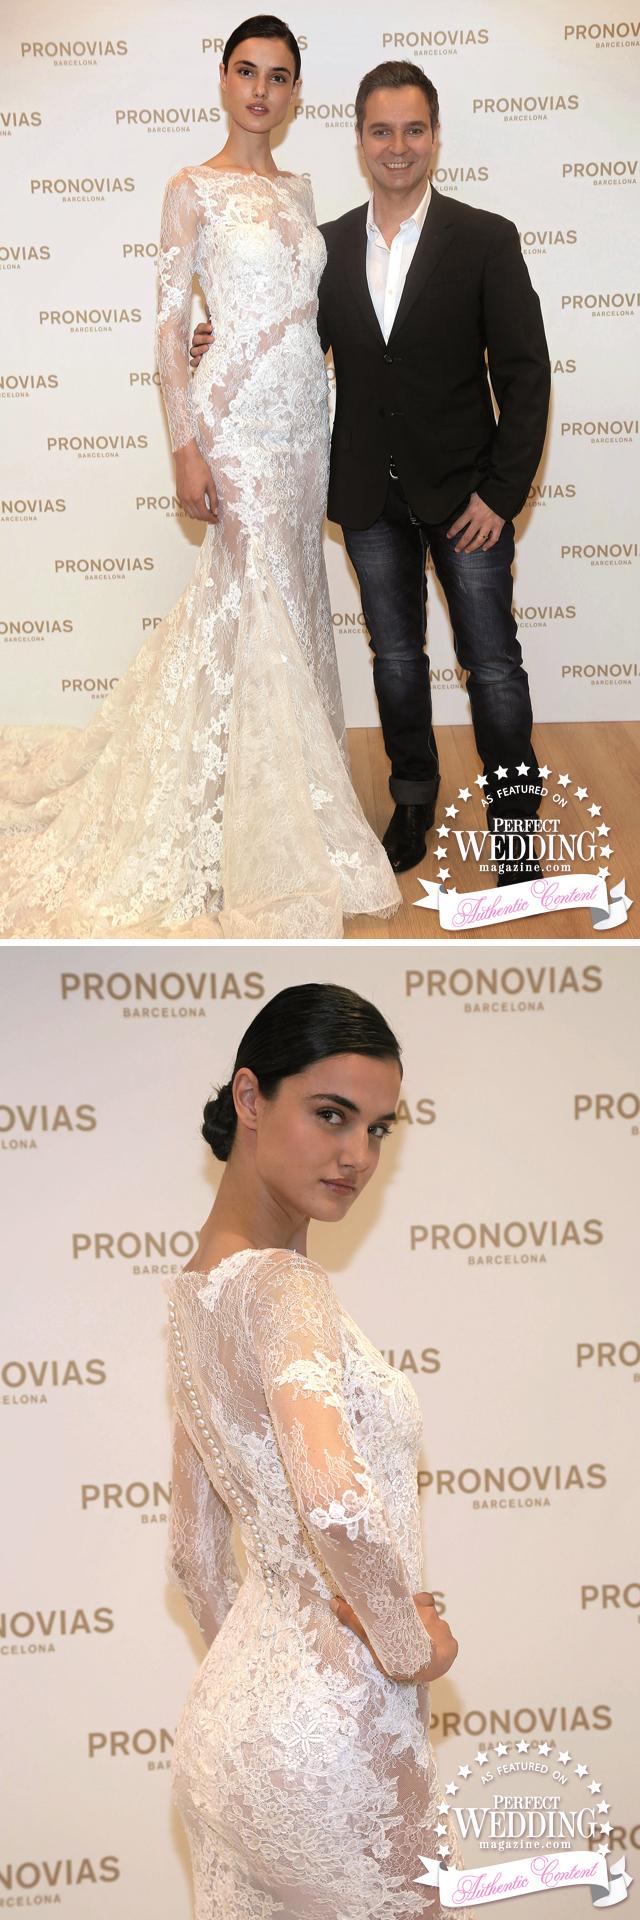 Pronovias, Pronovias 2016 Atelier Collection, Barcelona, Fashion, Bride